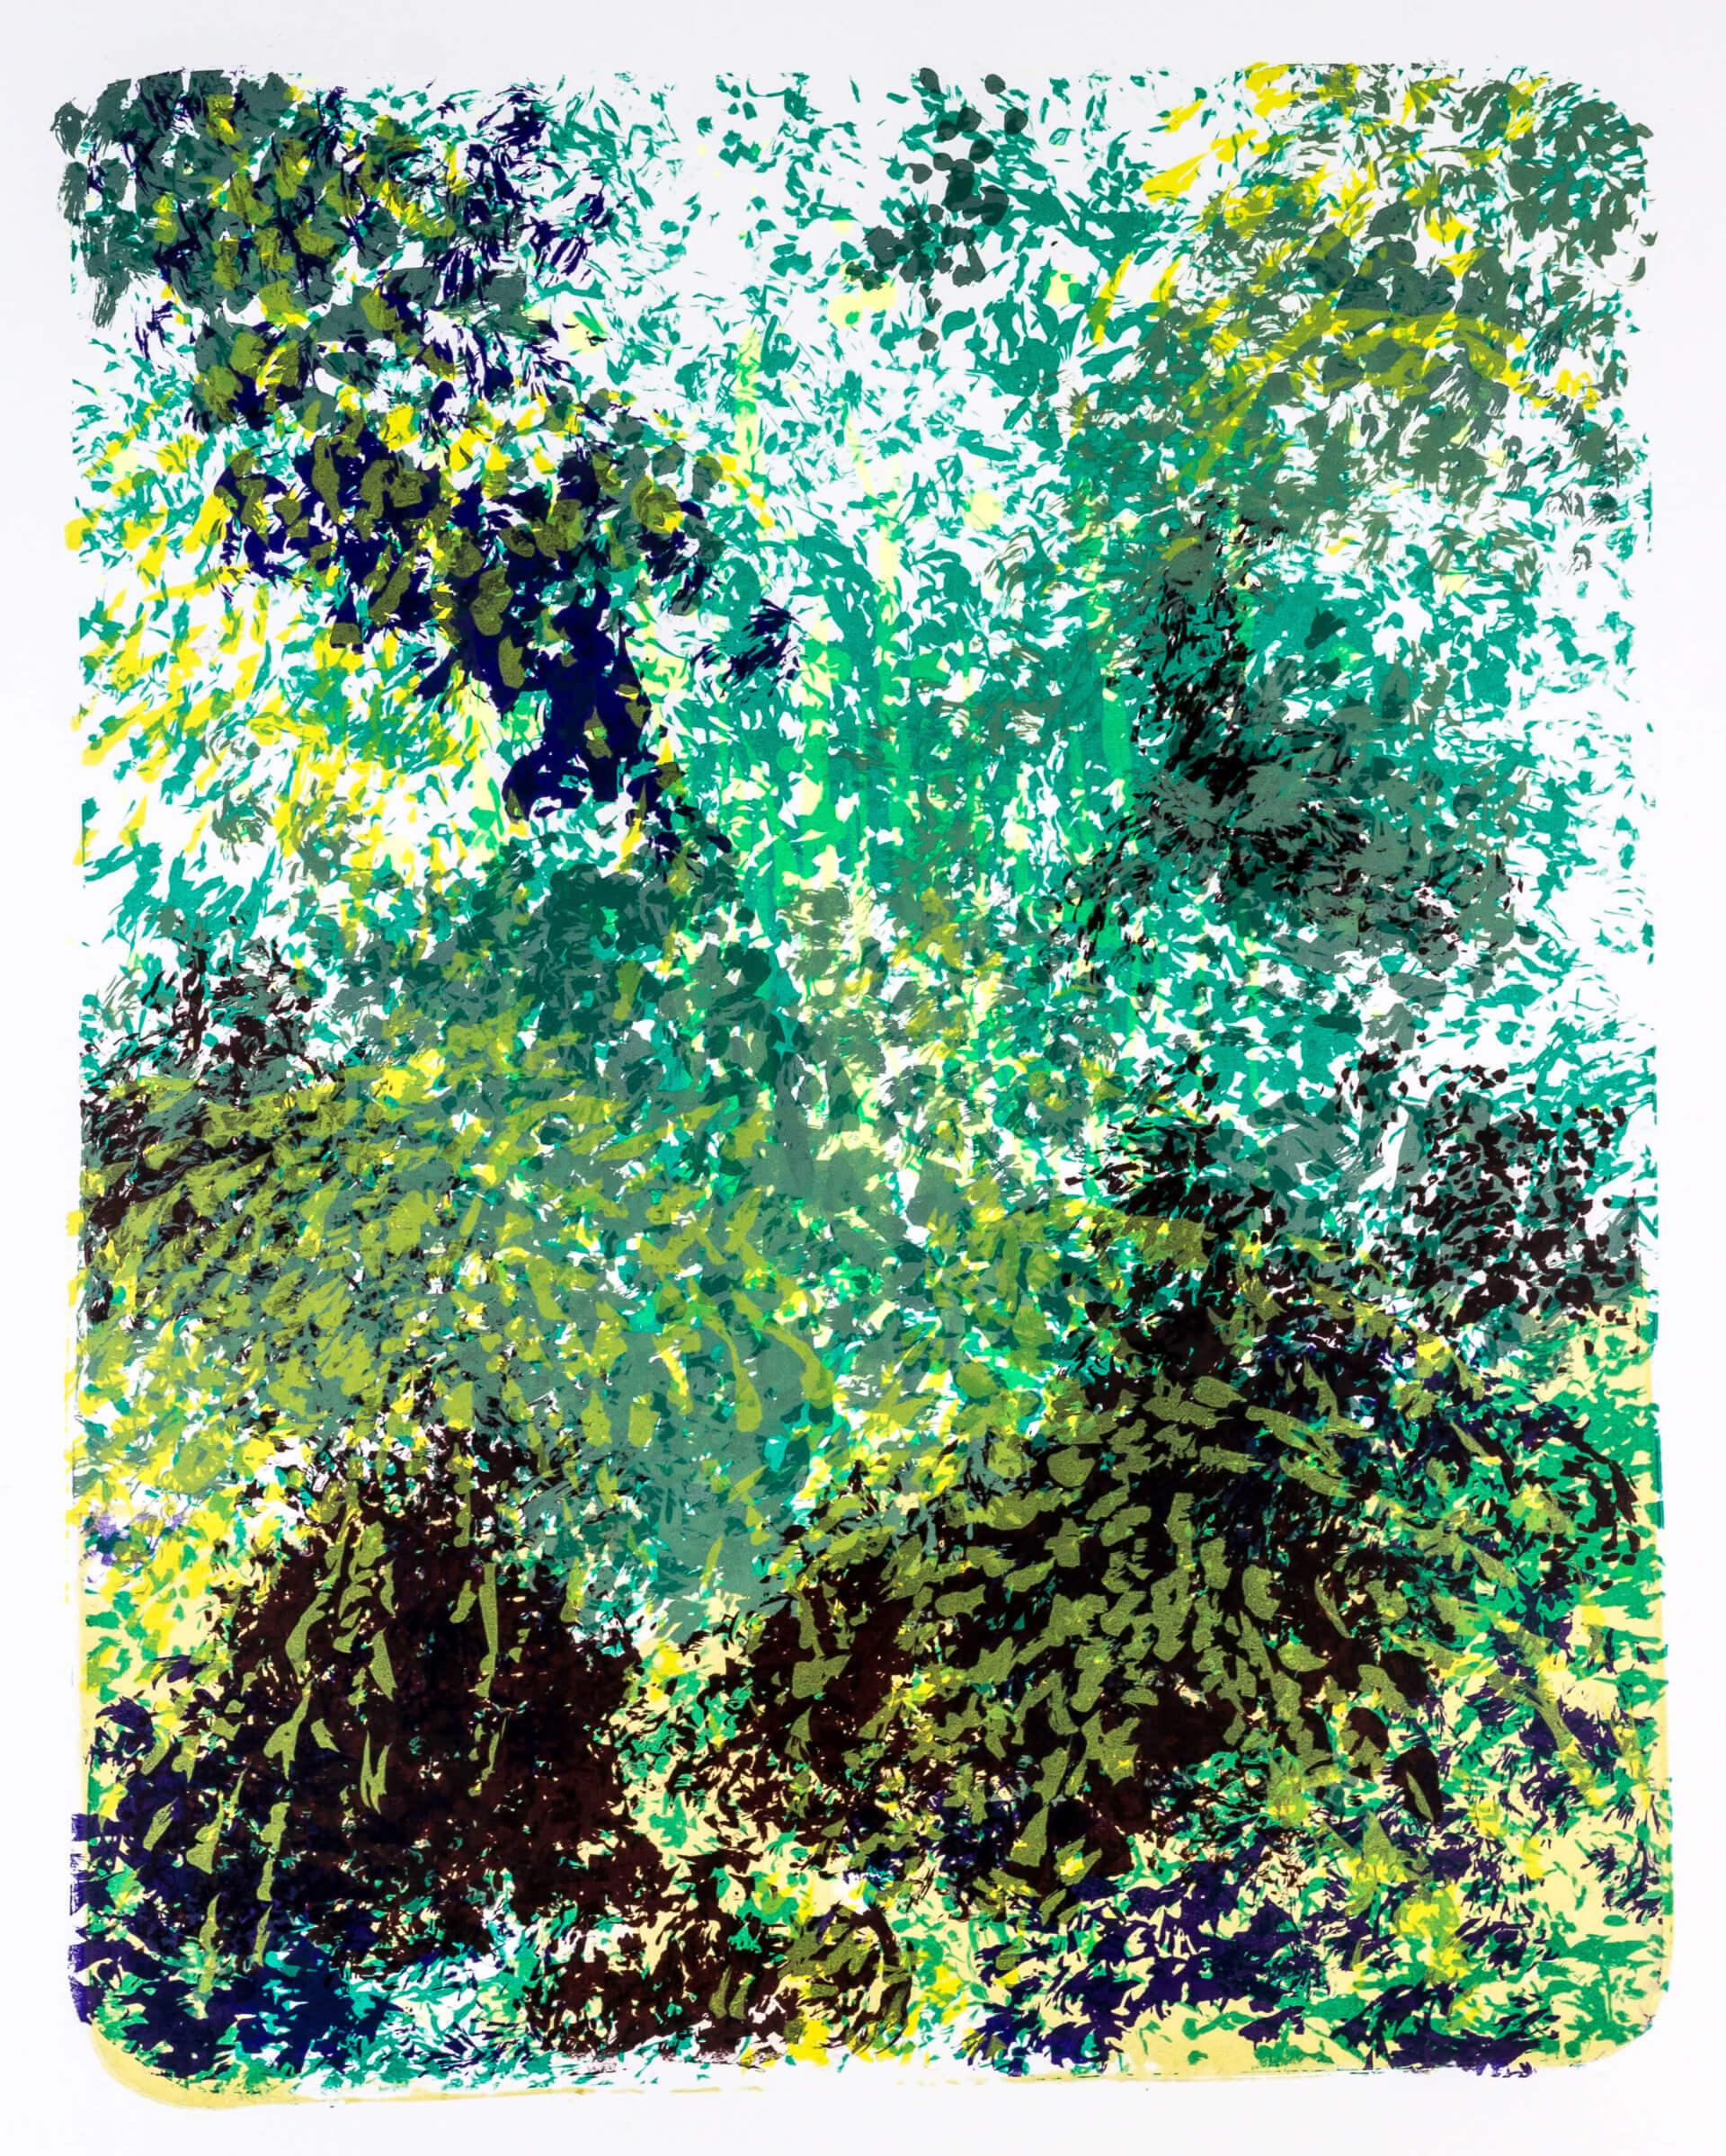 Katharina Albers, Wald X-XI, 2015, Farblithographie, Unikat, 50×40 cm